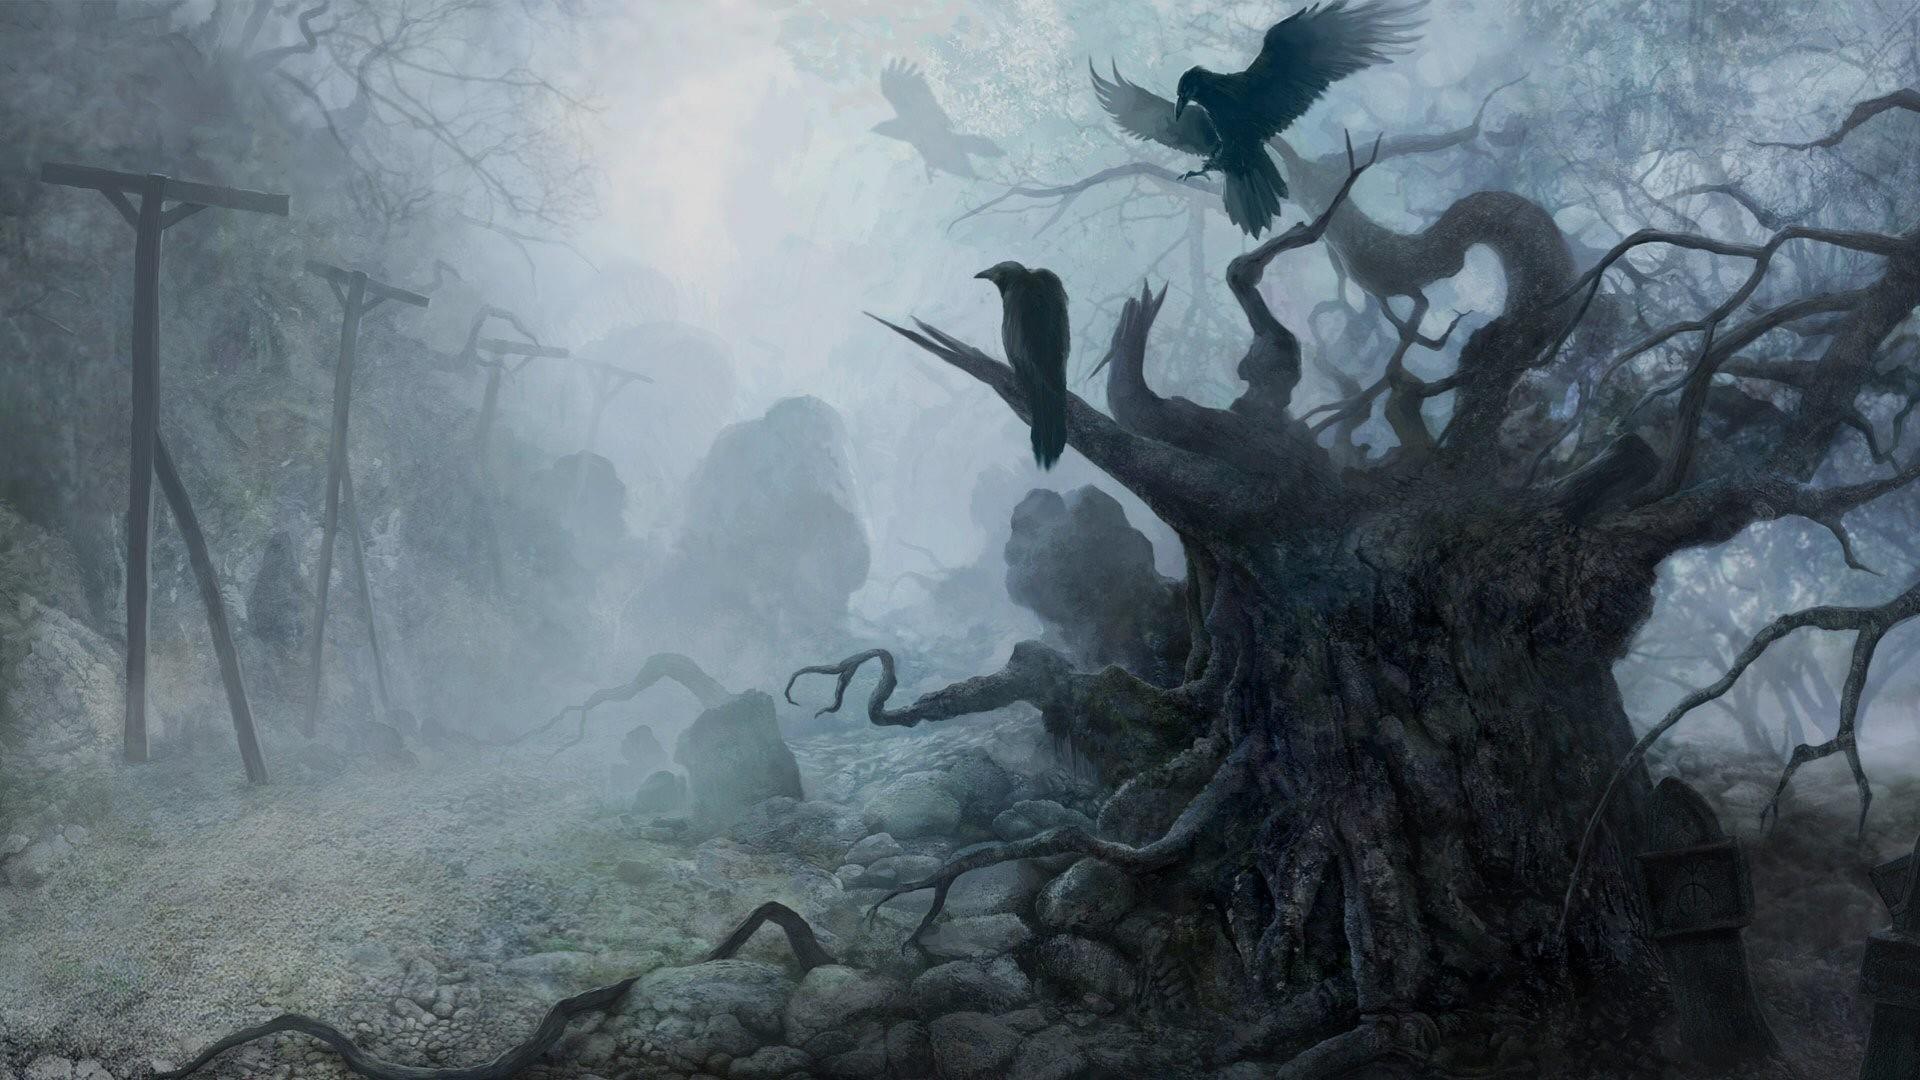 Creepy Landscape Wallpapers 1080p